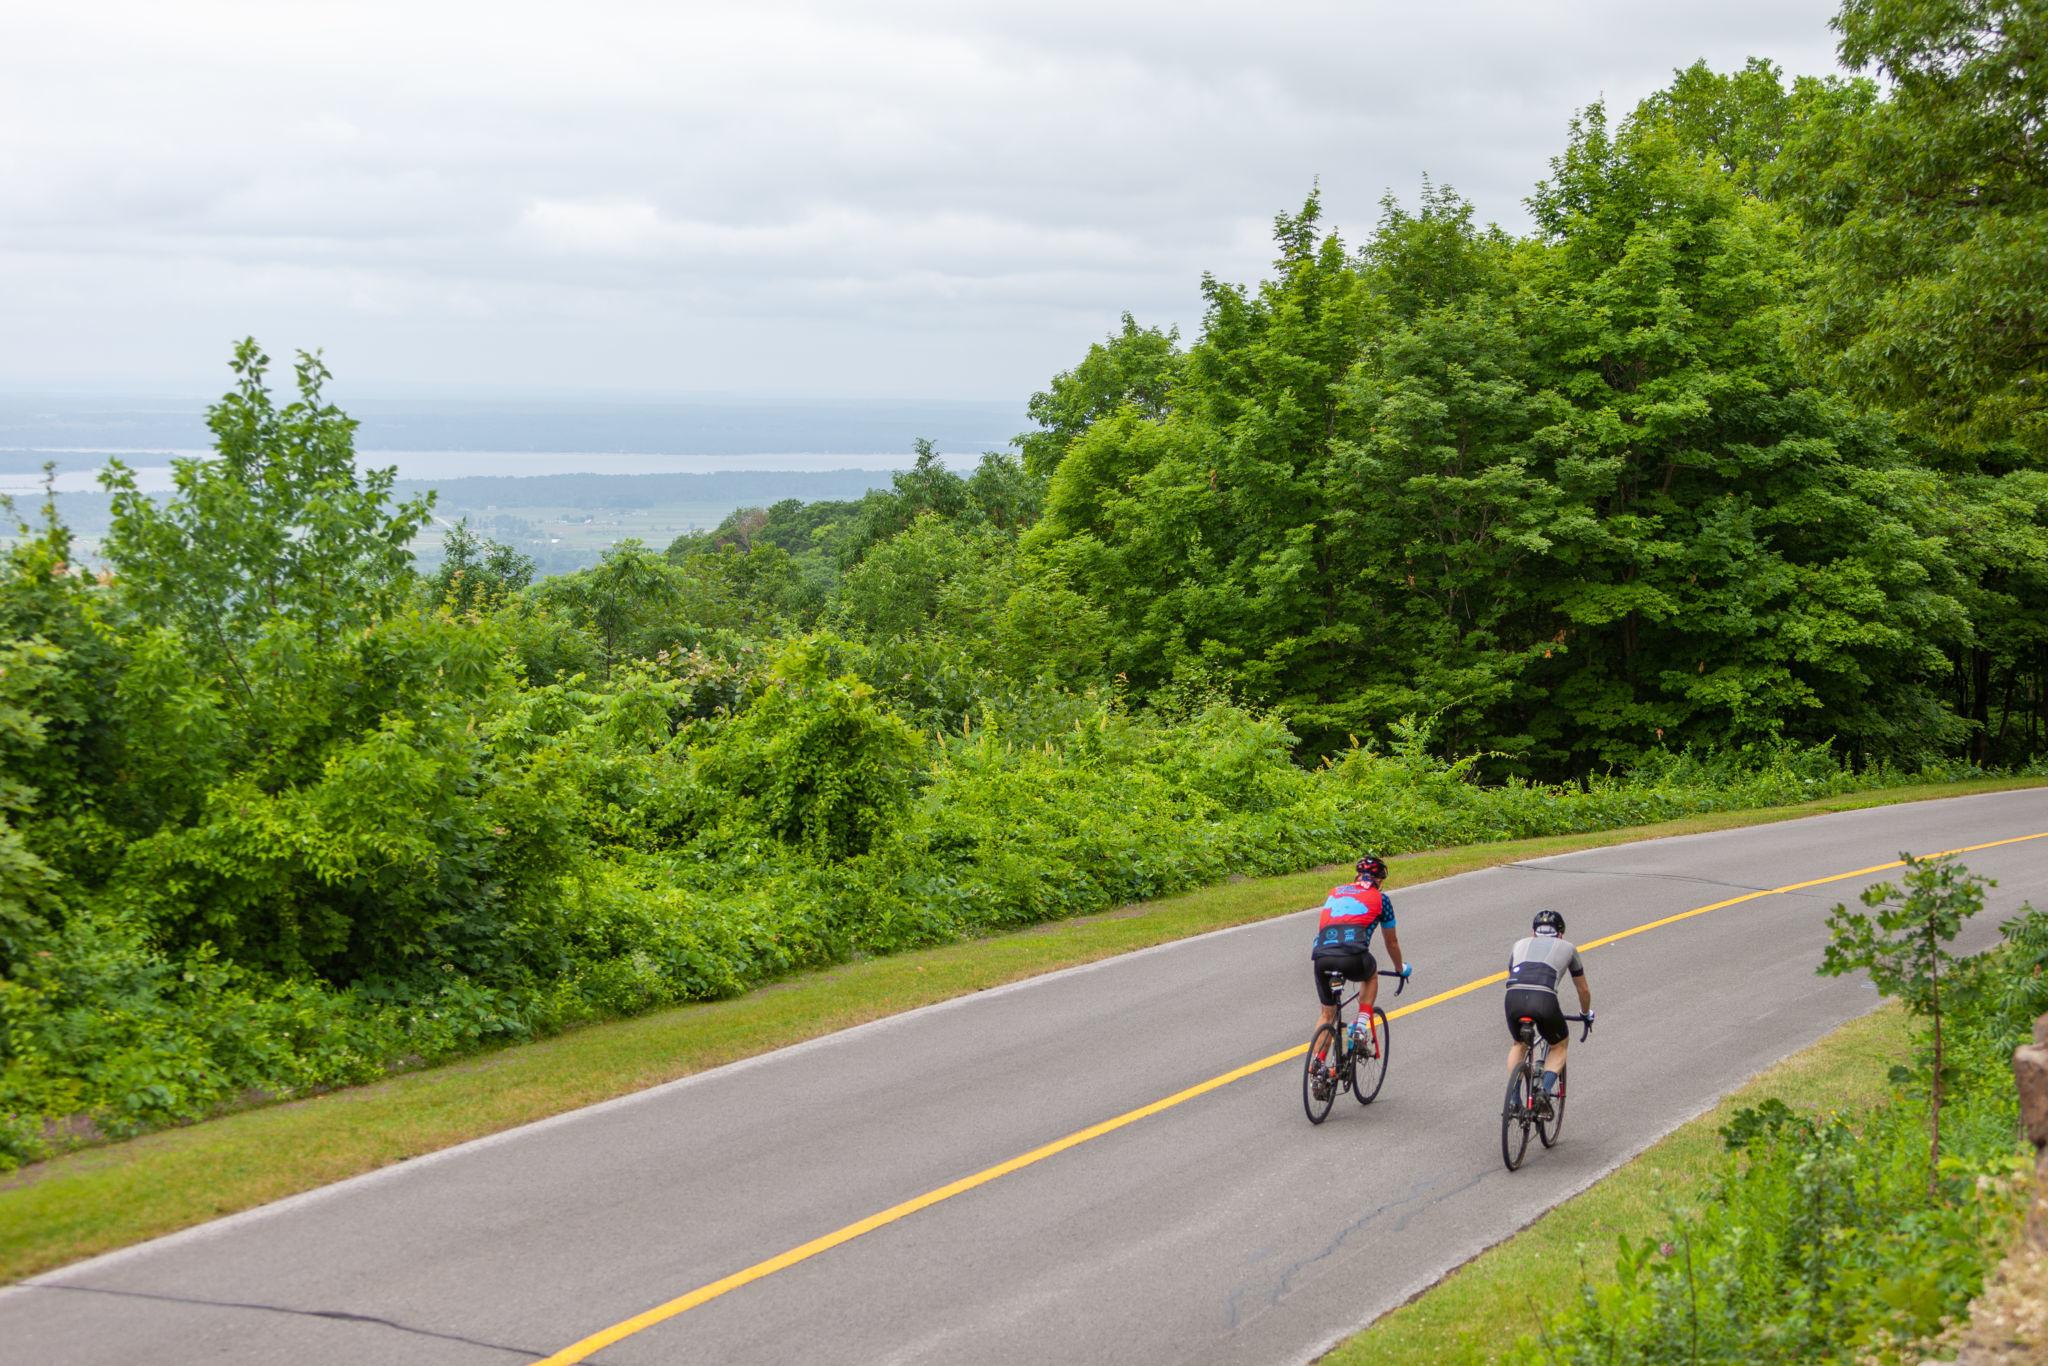 People biking on the car-free Gatineau Park parway.